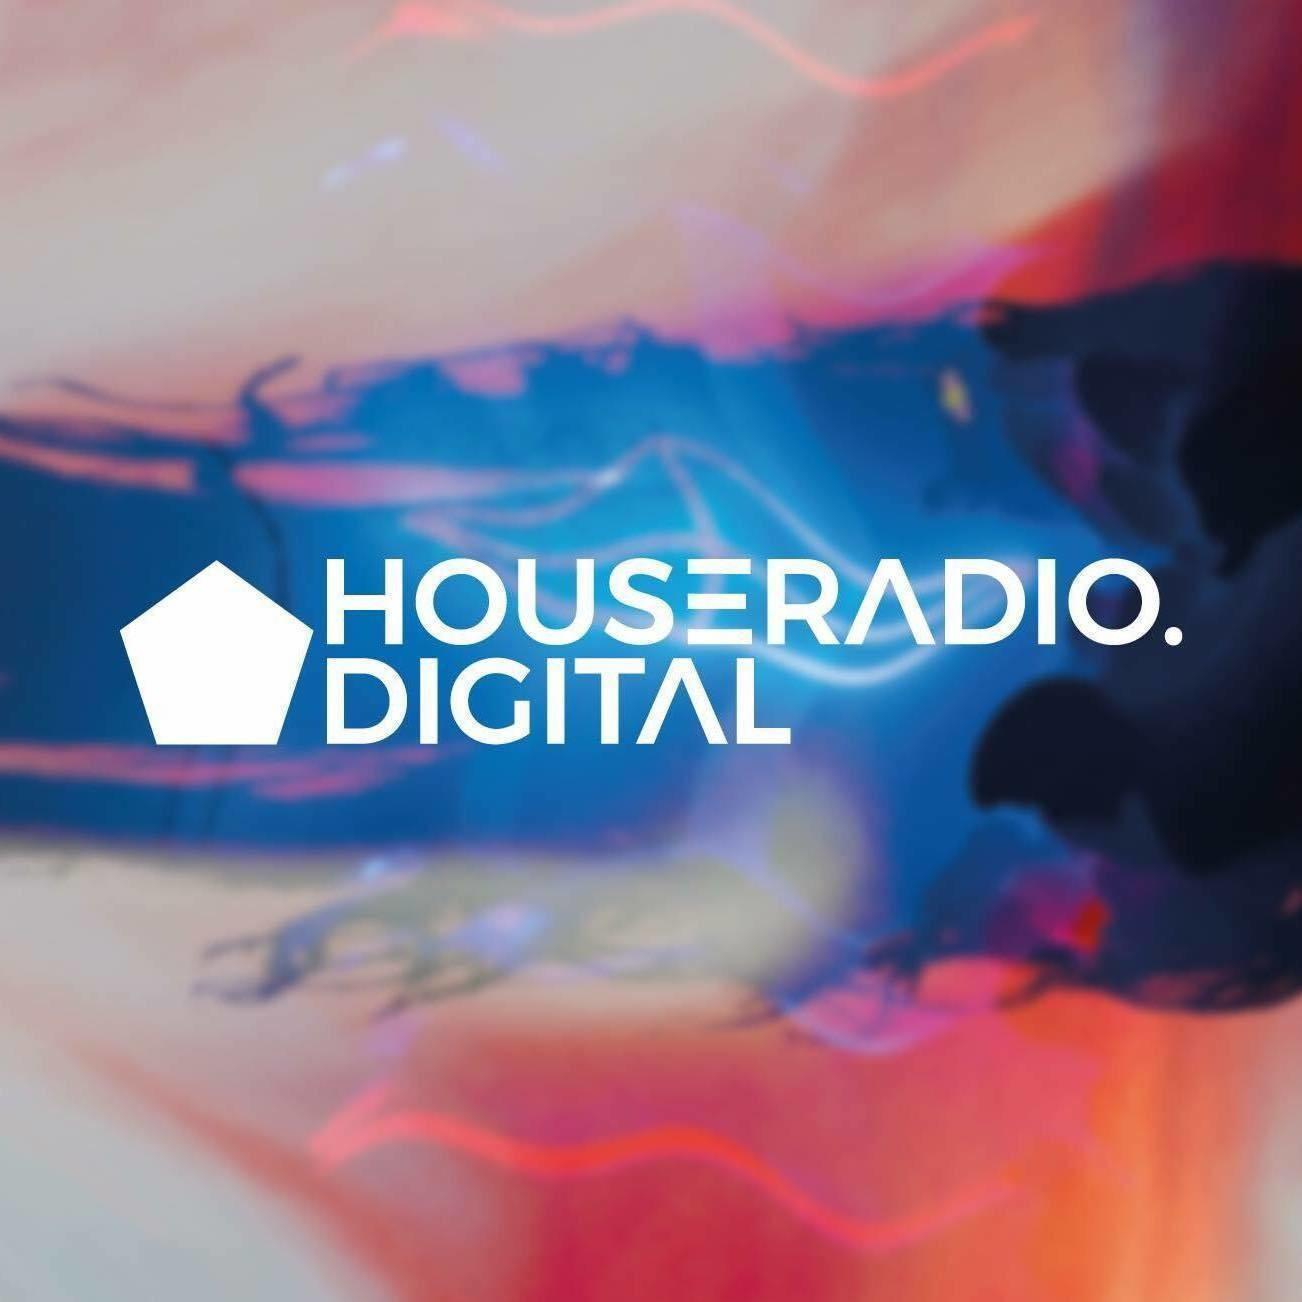 Profilo HOUSE RADIO DIGITAL Canale Tv